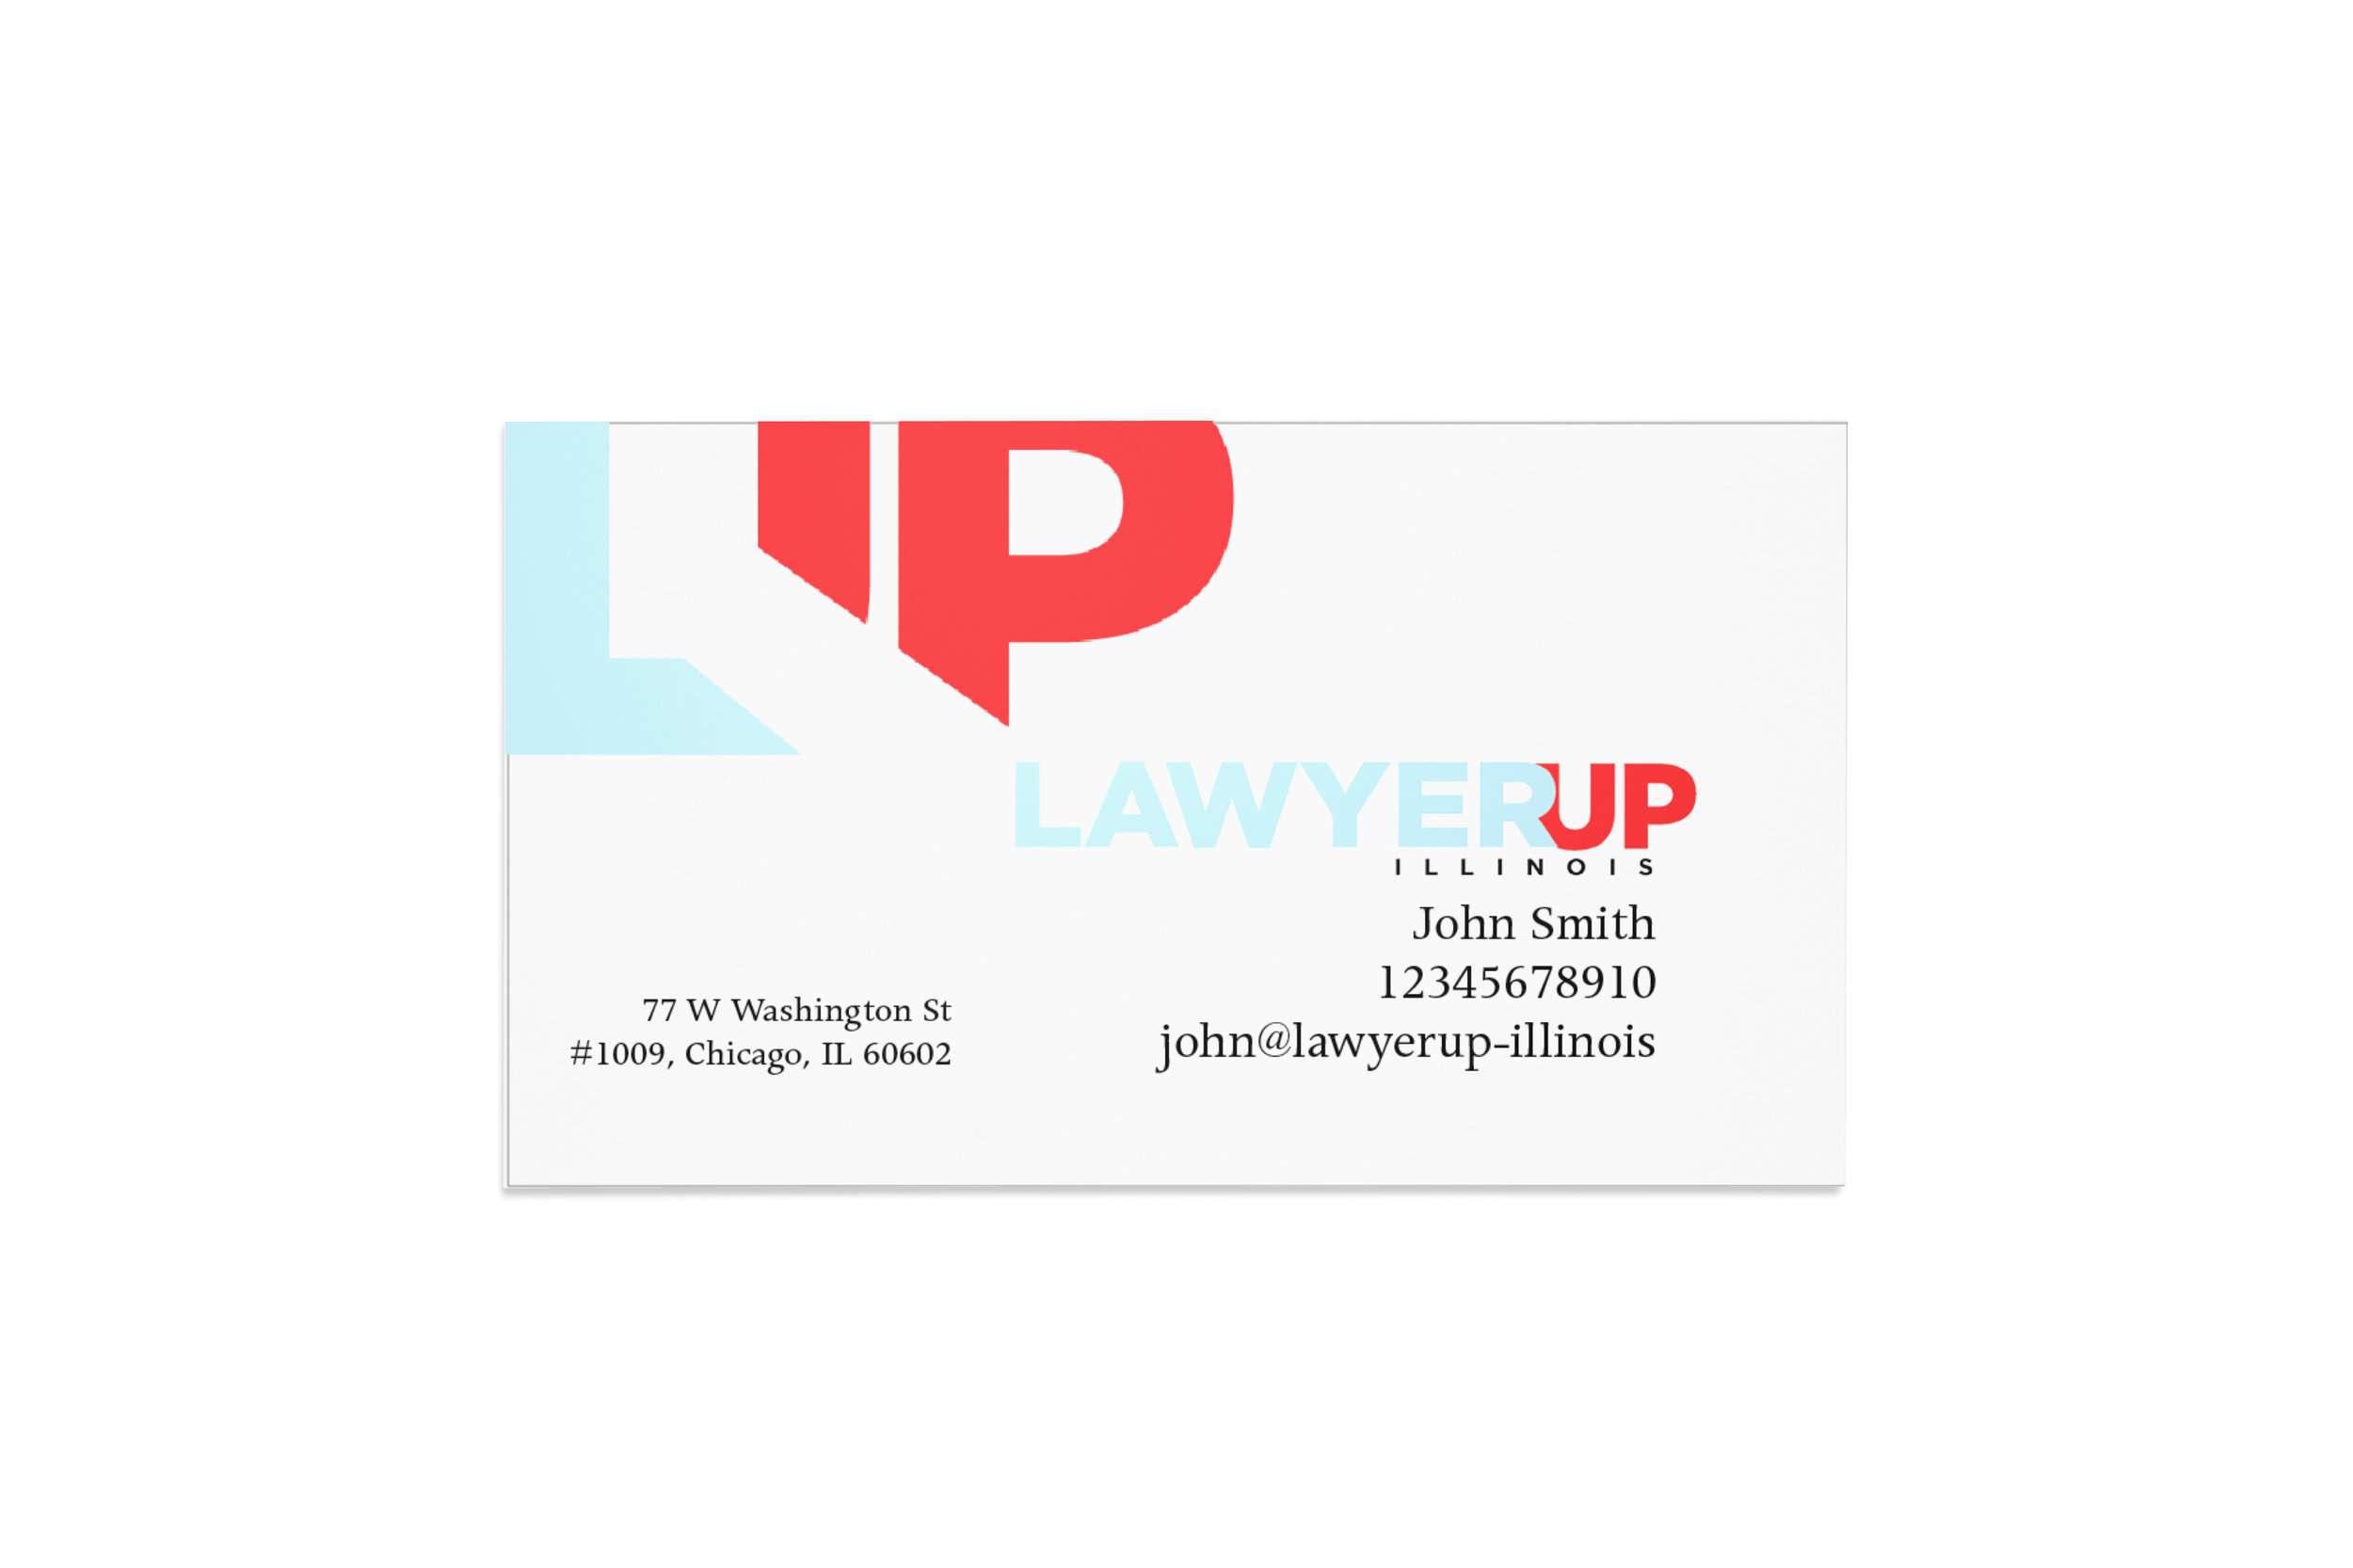 Business Card 0413 2018-04-15.jpg